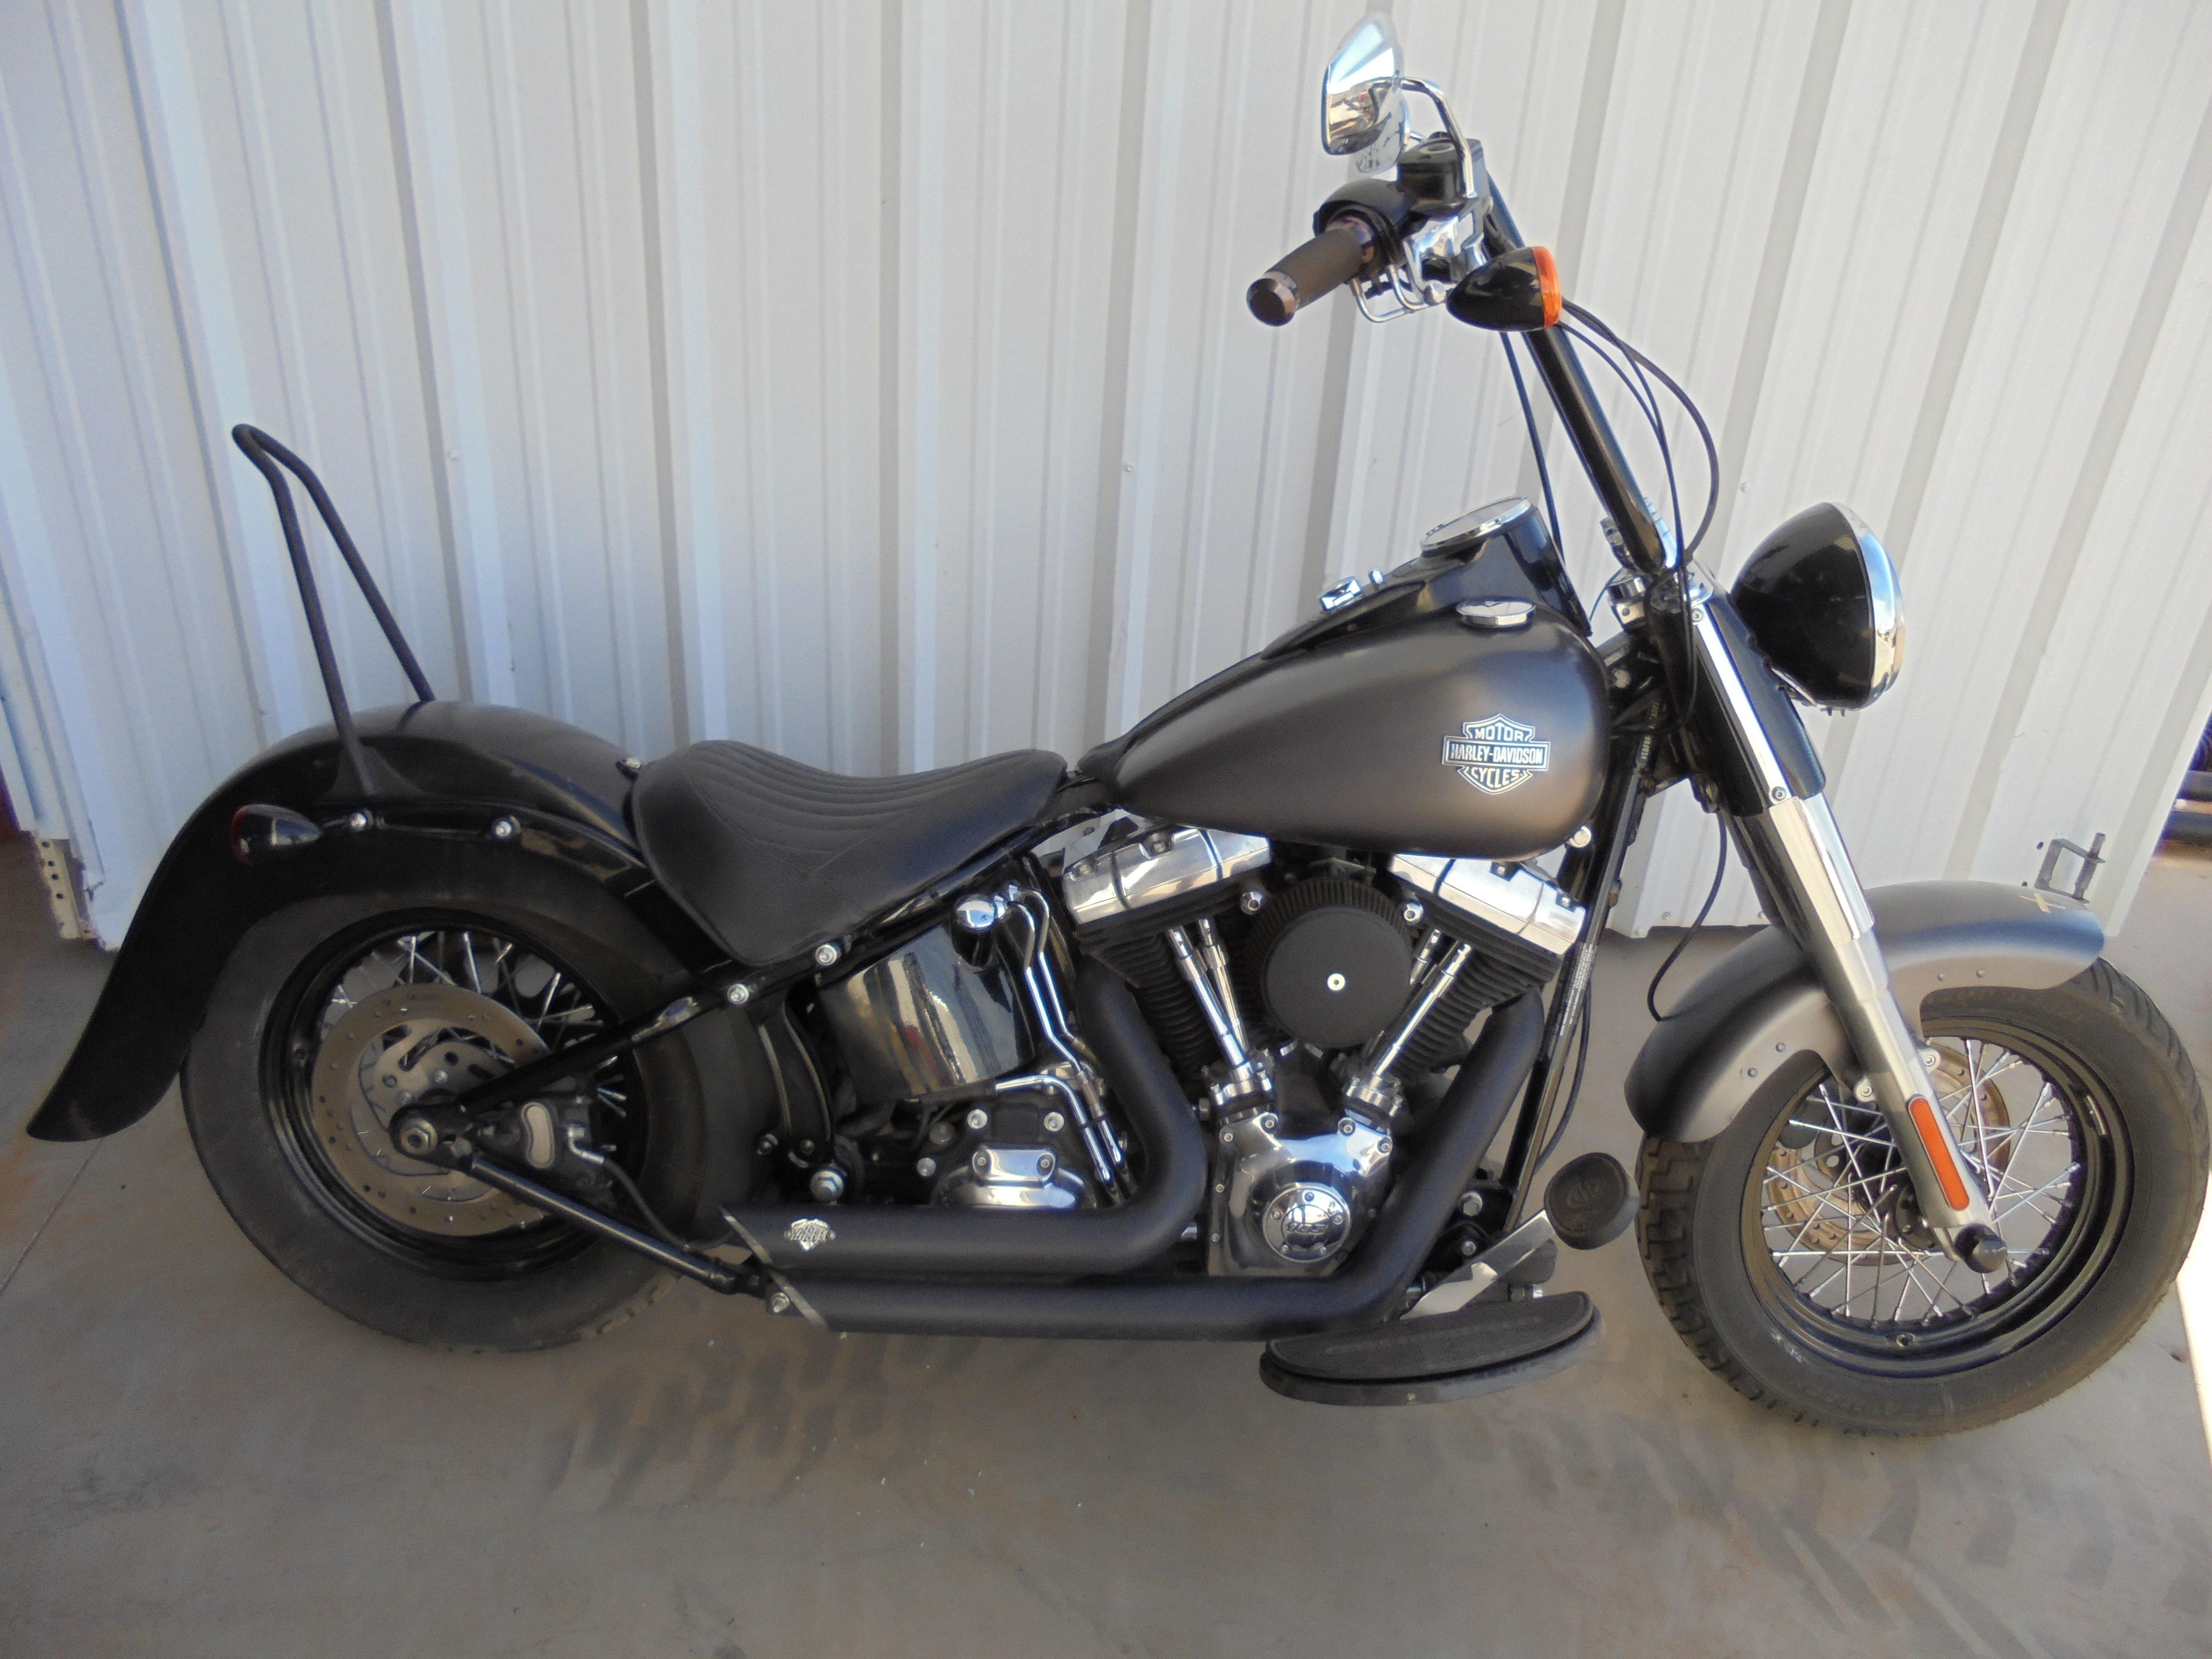 Cvo For Sale Pennsylvania >> Harley-Davidson® Softail Slim™ for Sale (760 Bikes, Page 1) | ChopperExchange